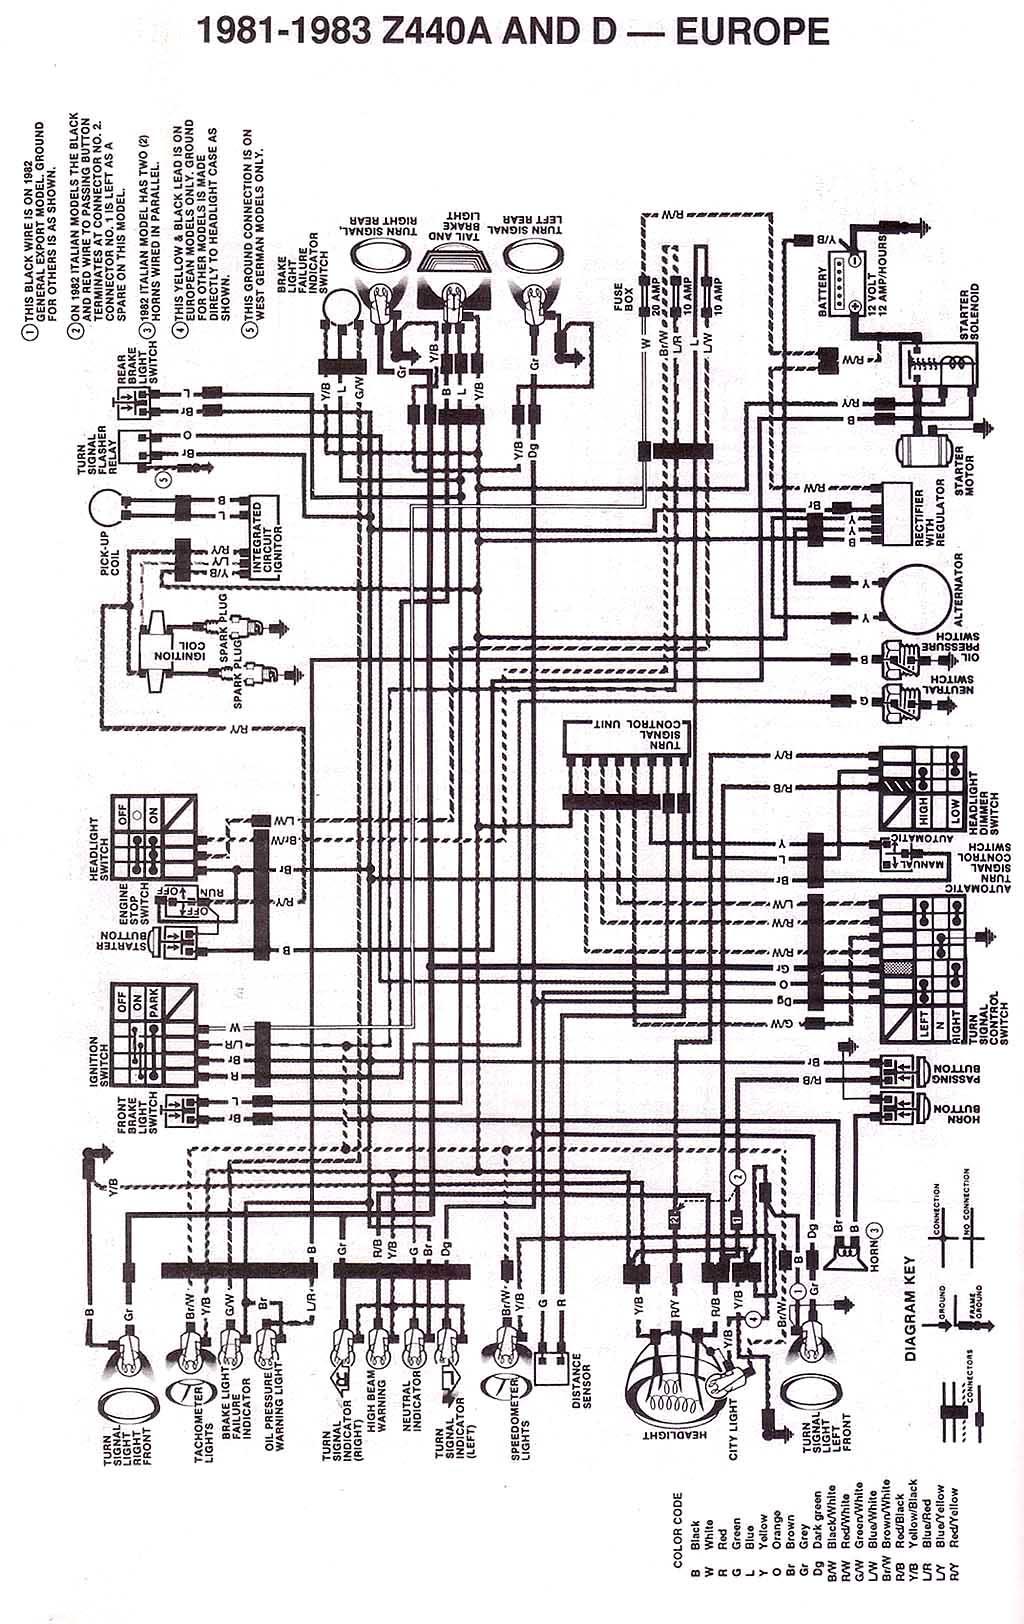 [DIAGRAM] 1981 Kawasaki Kz440 Wiring Diagram FULL Version ...